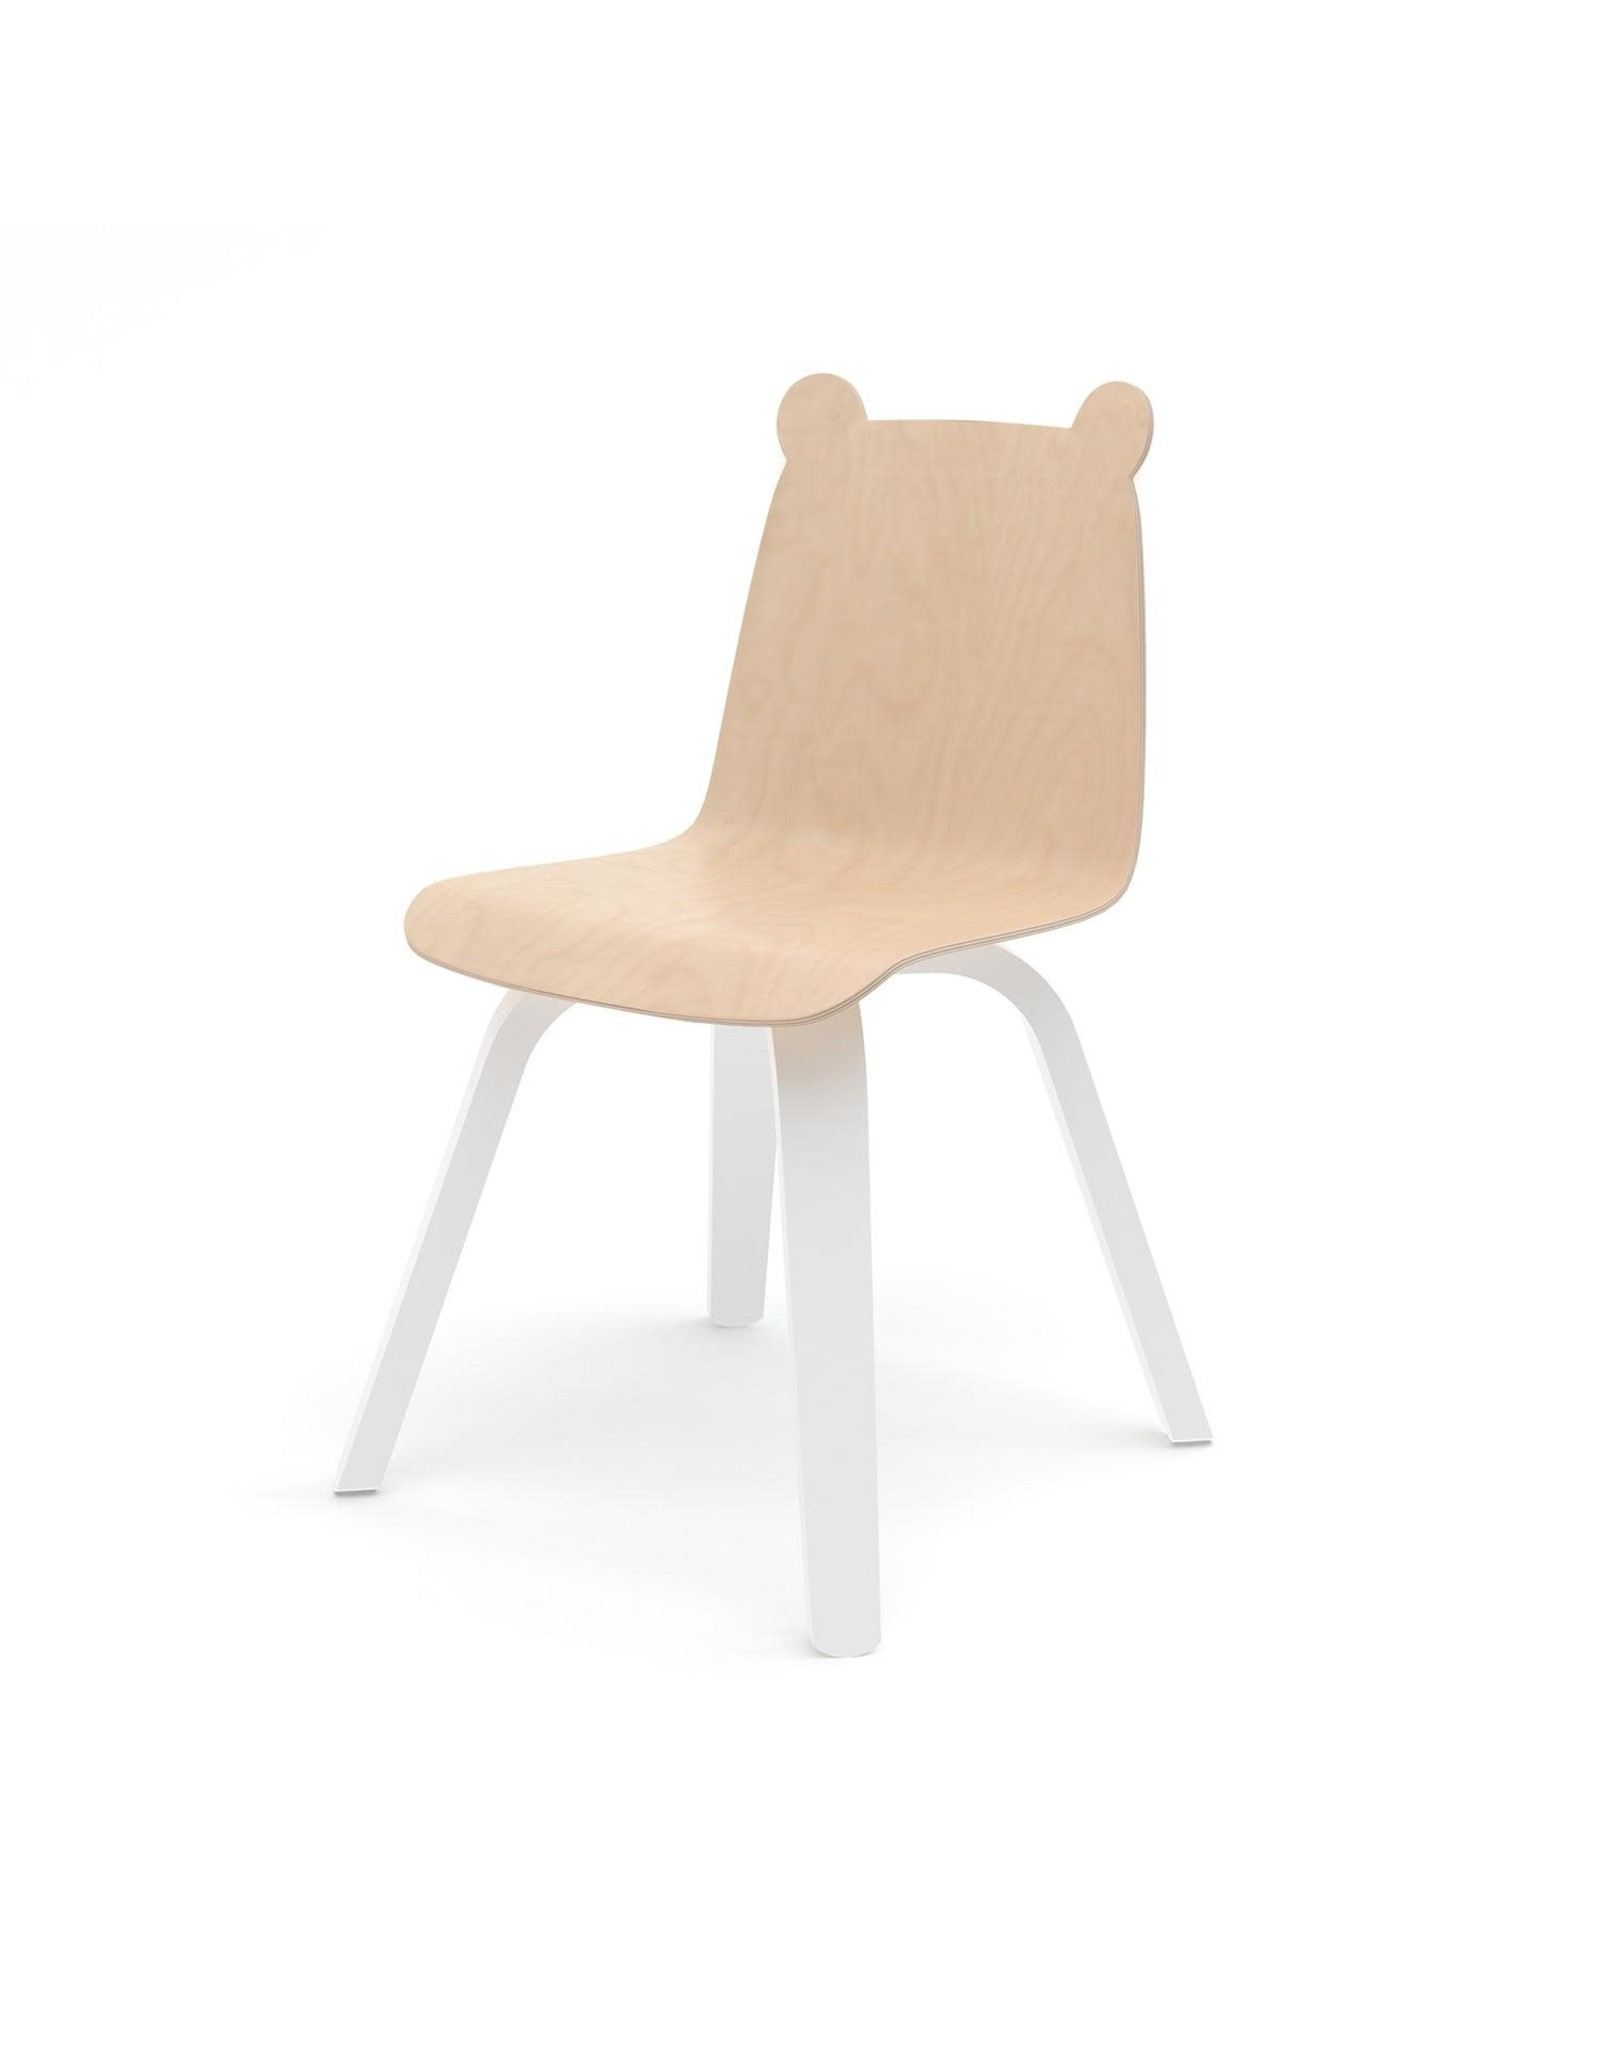 Chairs Bear White Birch set of 2